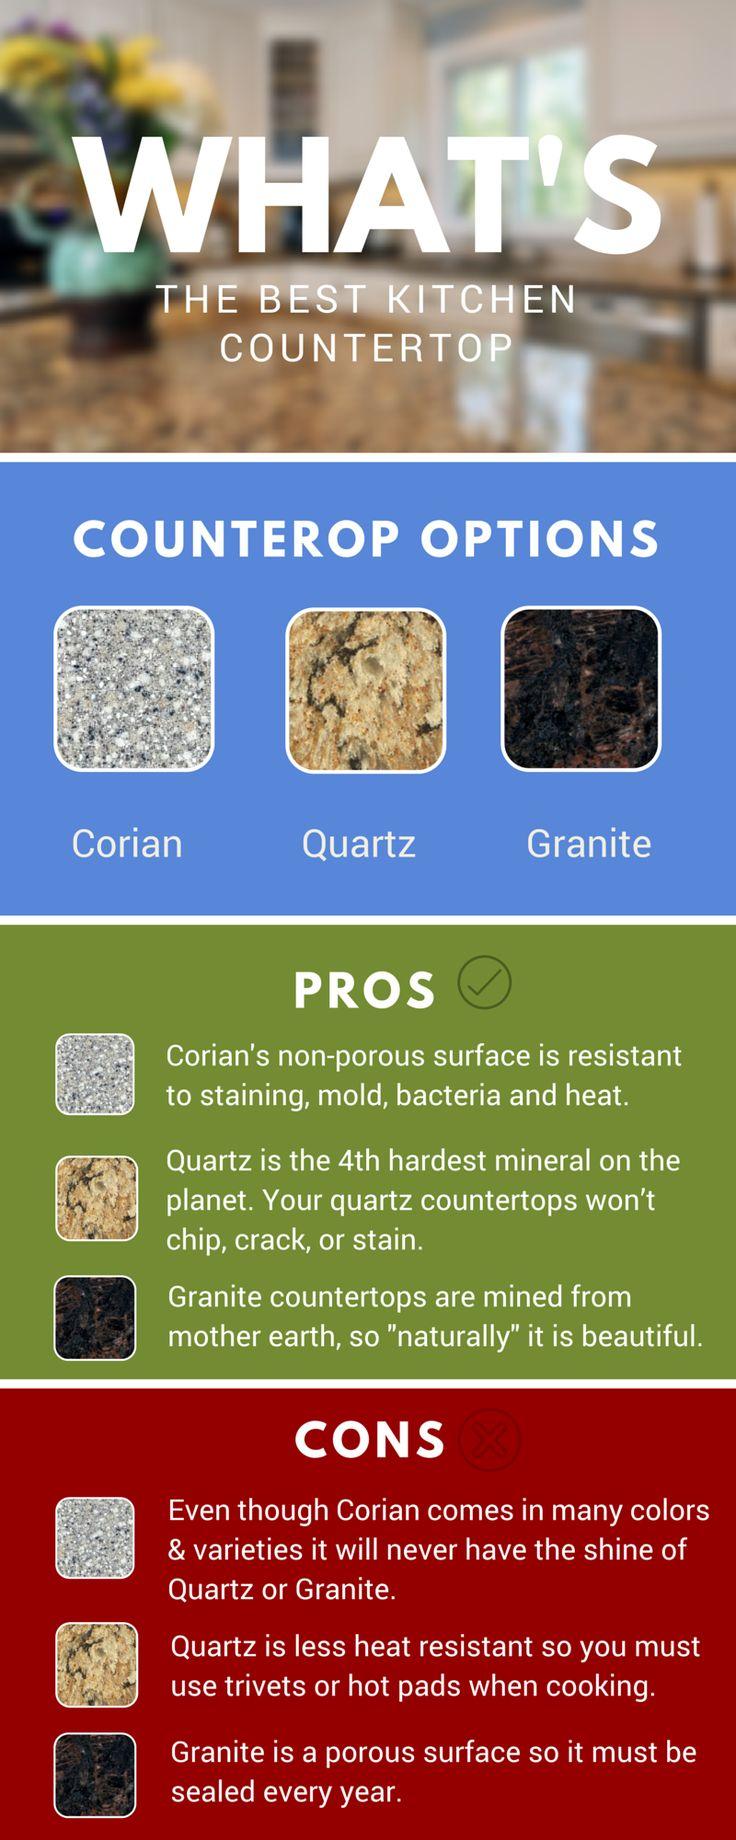 25 Best Ideas About Kitchen Countertops On Pinterest Countertops Wood Kitchen Countertops And White Marble Kitchen